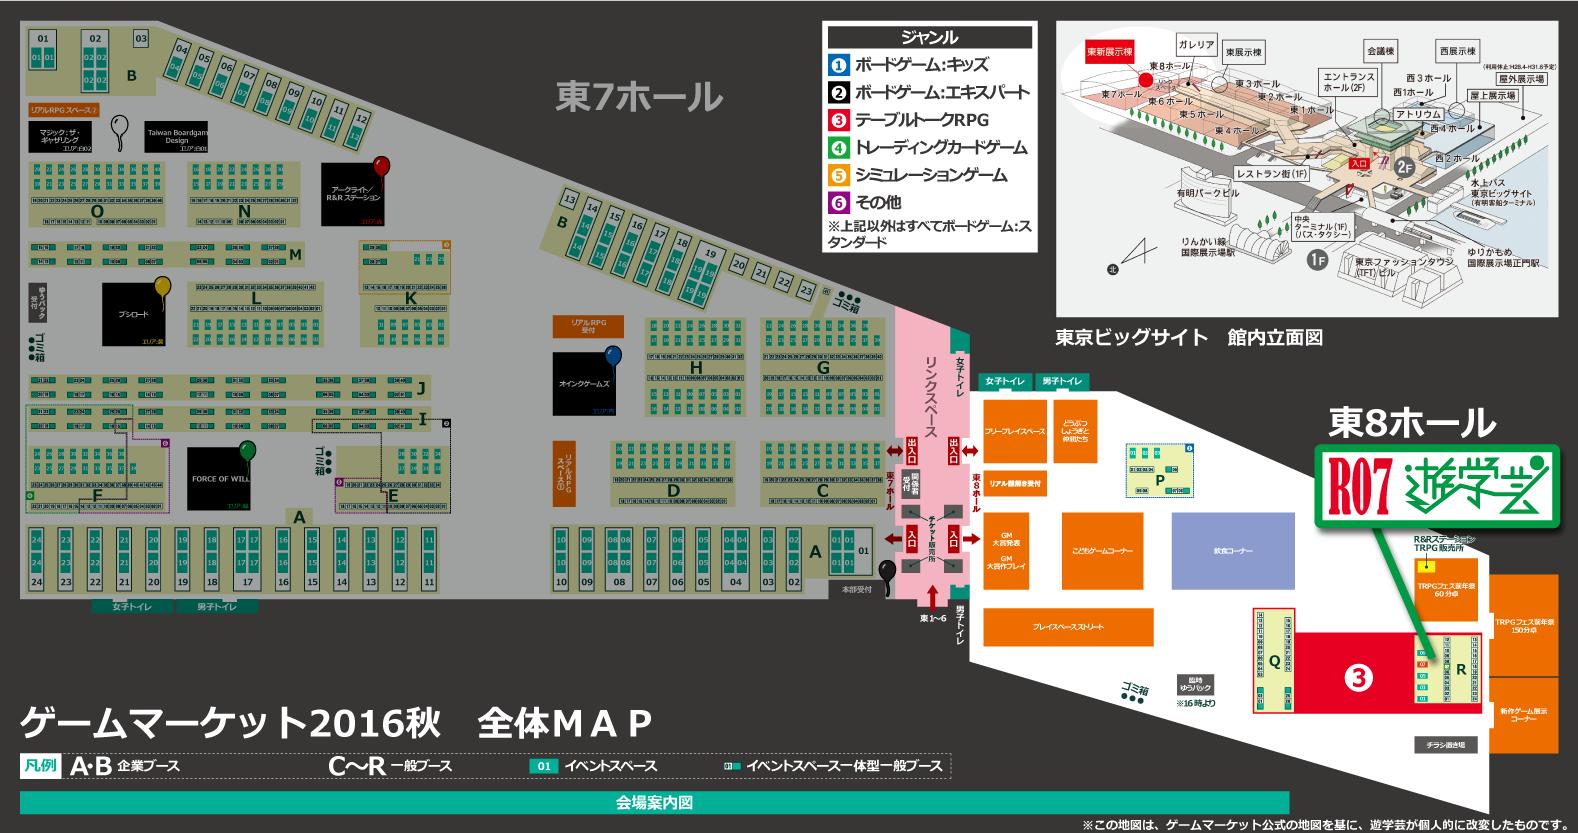 GM2016akiMAP_yuugakugei_dai.png